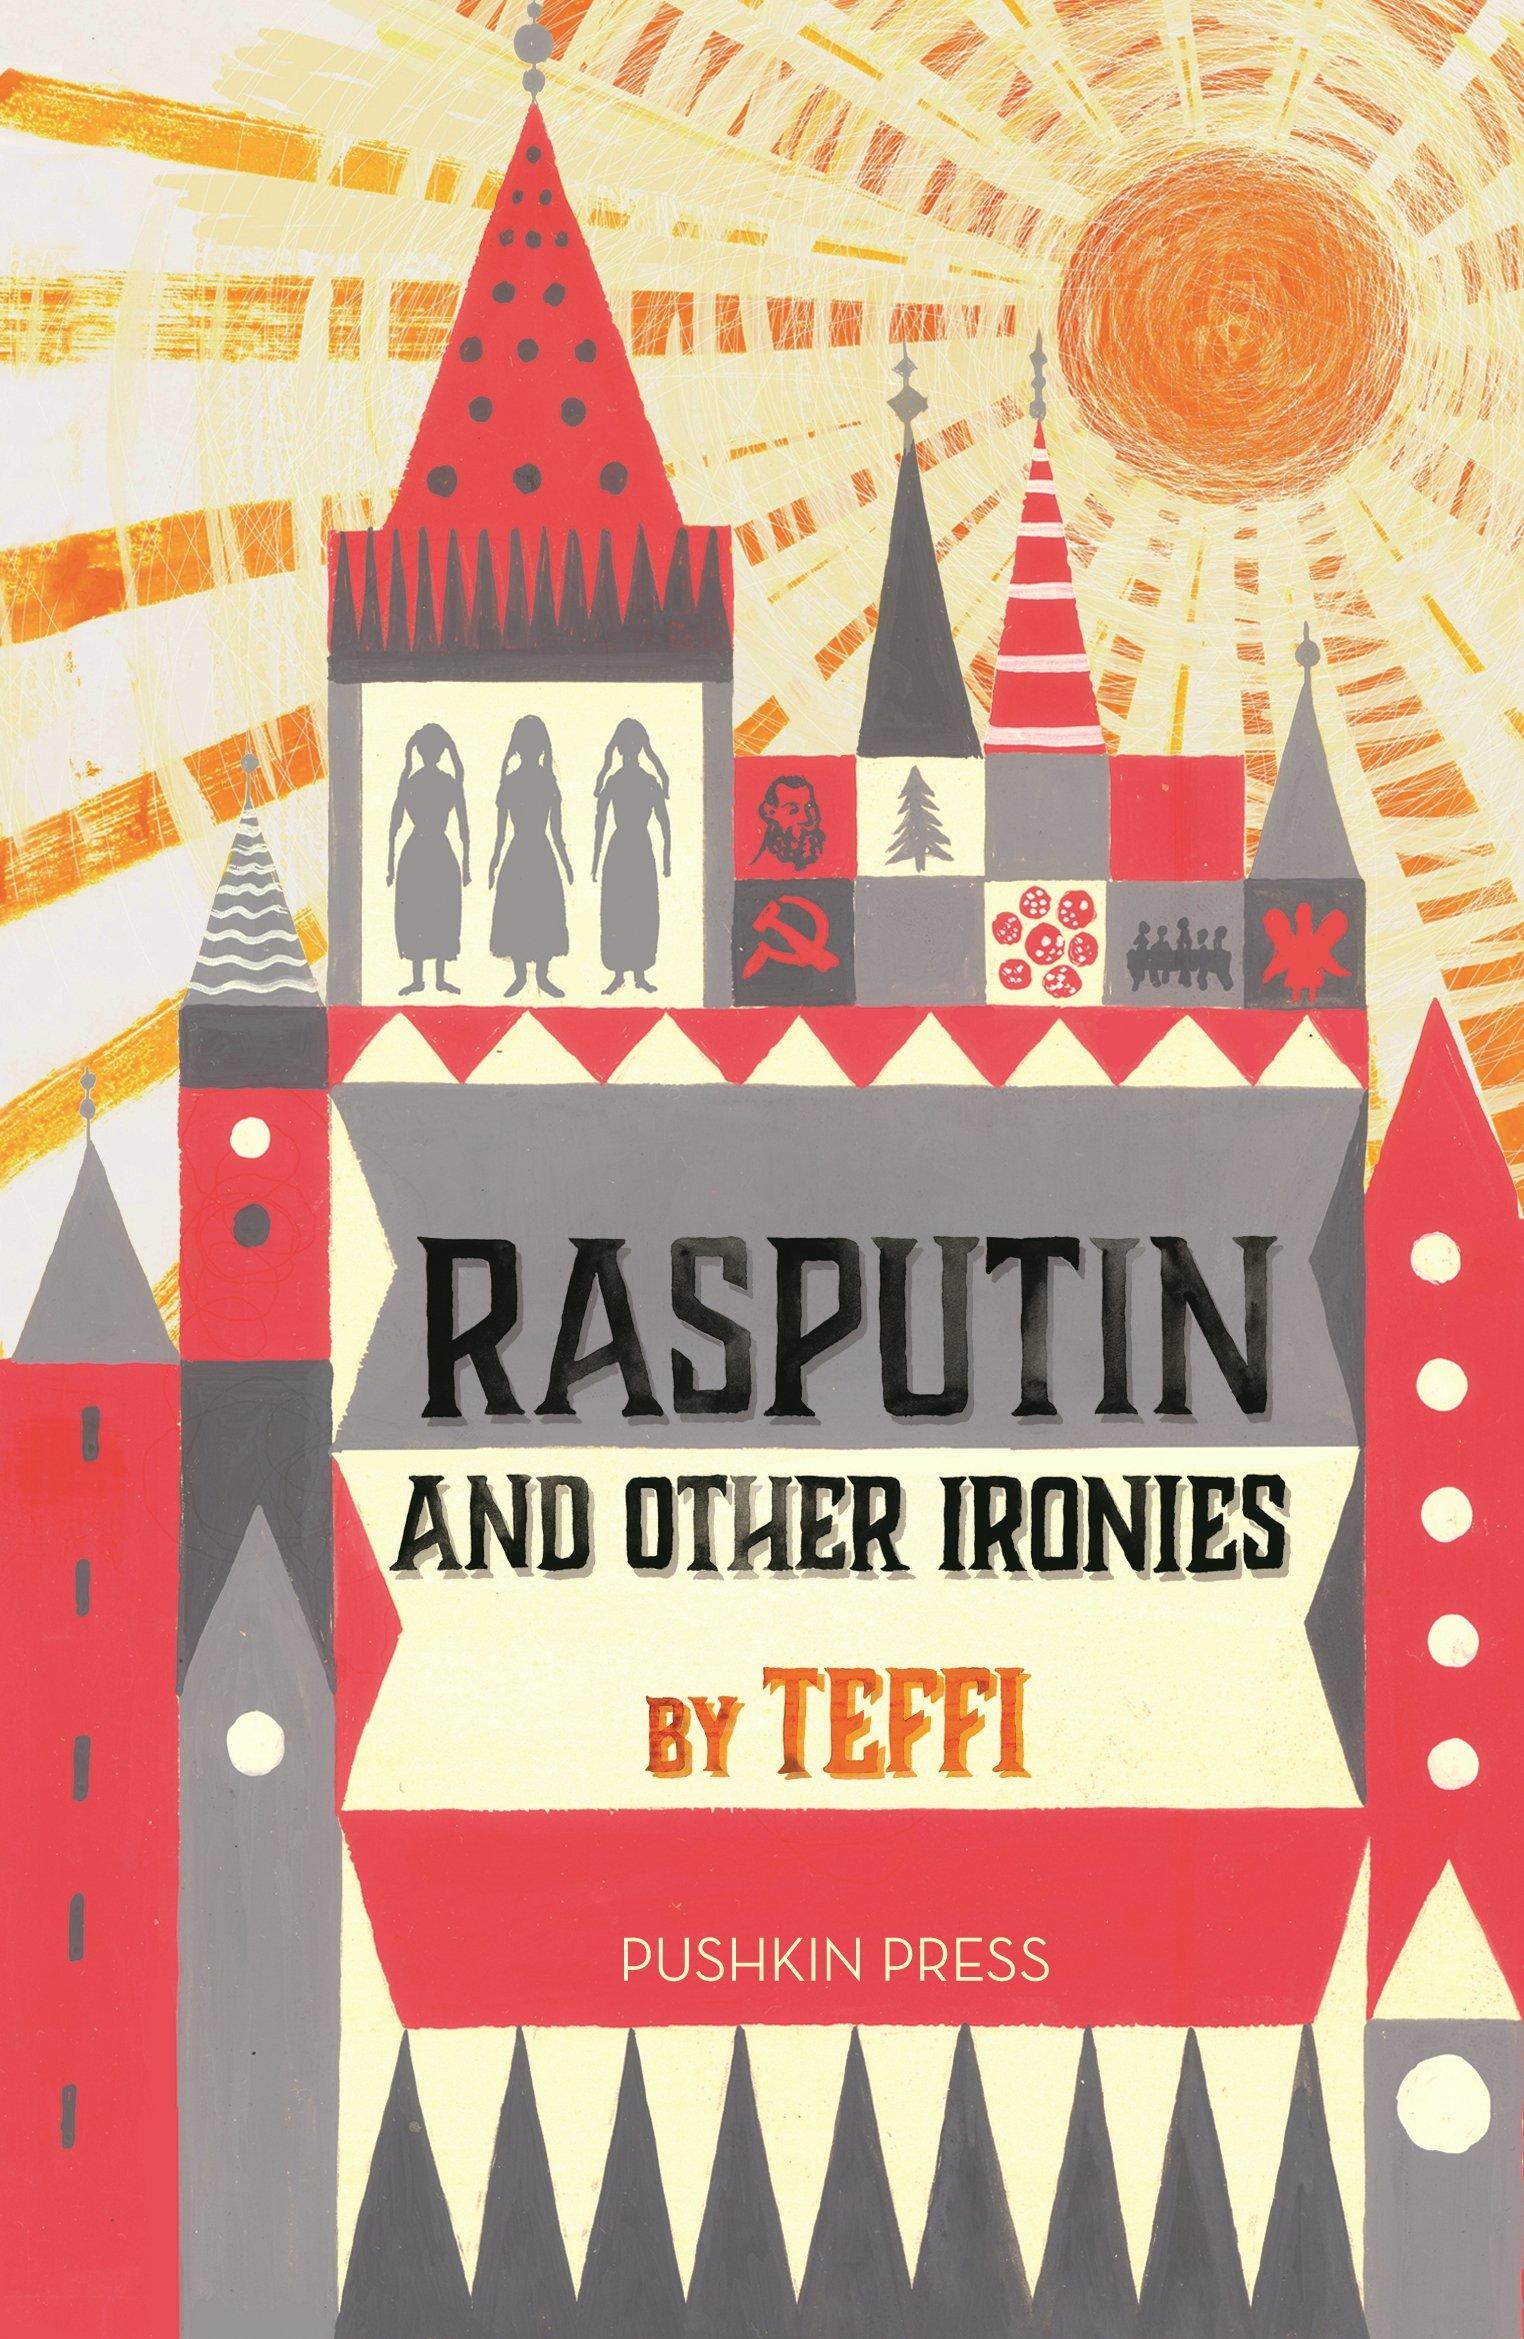 Rasputin and Other Ironies: Amazon.co.uk: Teffi, Robert & Elizabeth  Chandler, Rose France, Anne Marie Jackson: 9781782272175: Books